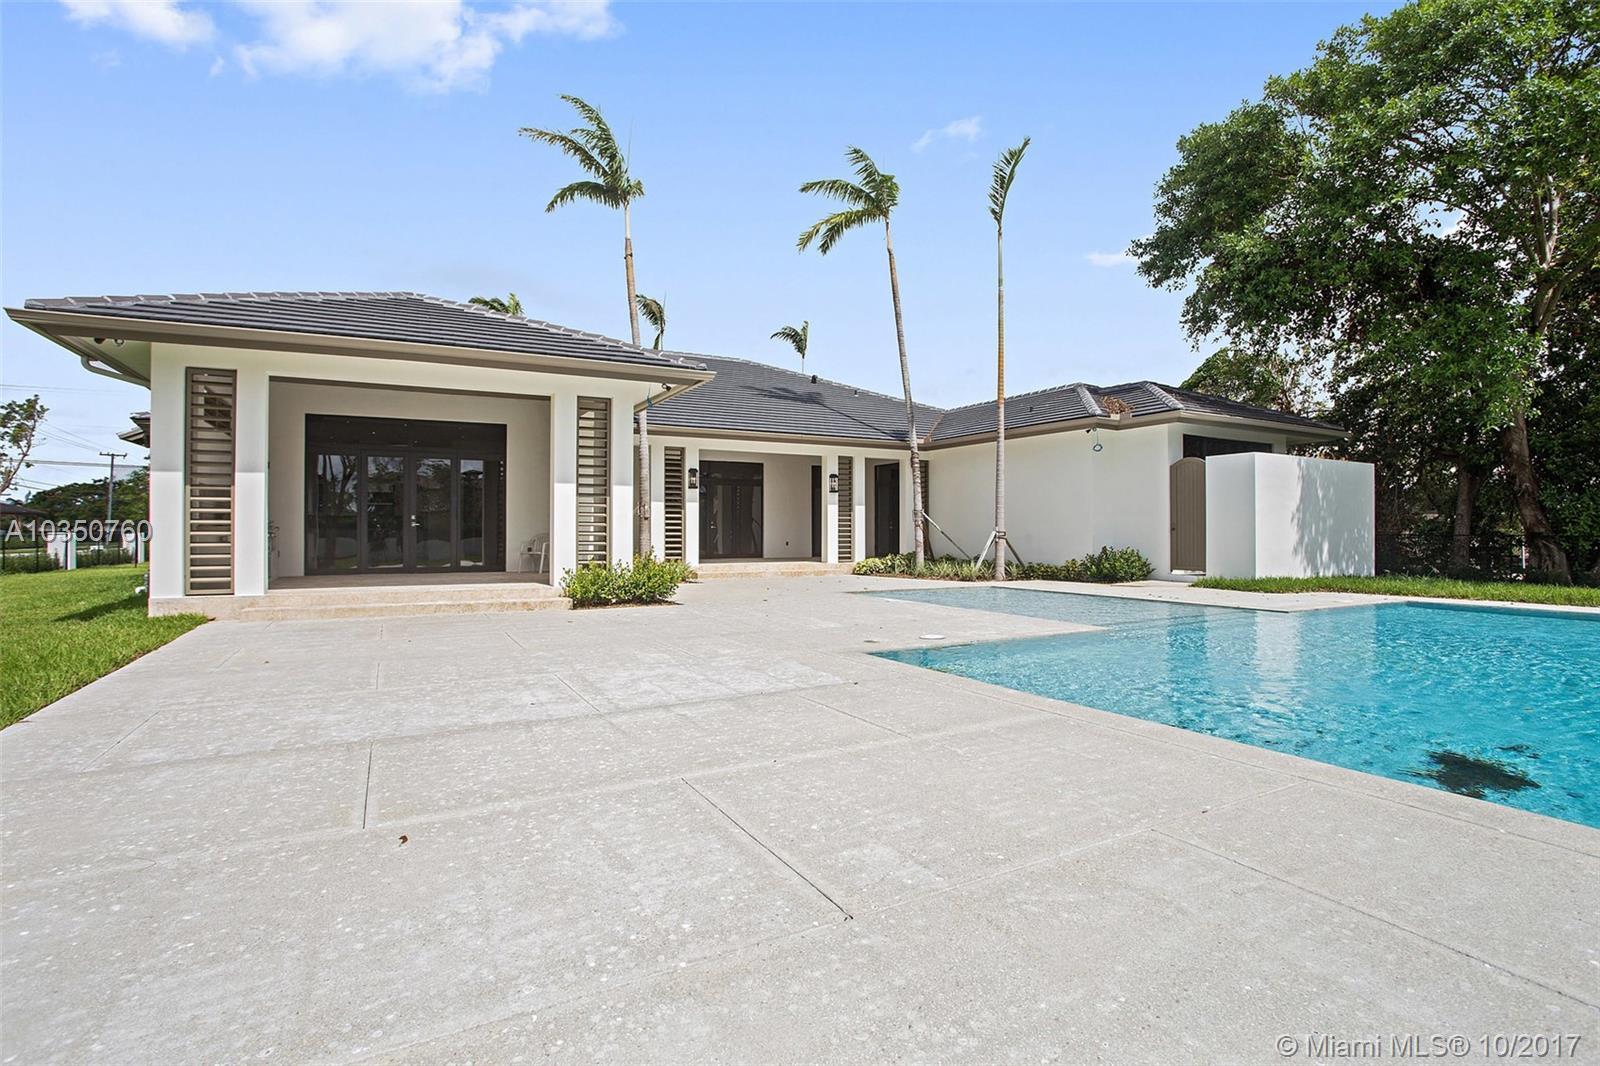 6005 SW 102nd Ave, Miami , FL 33173